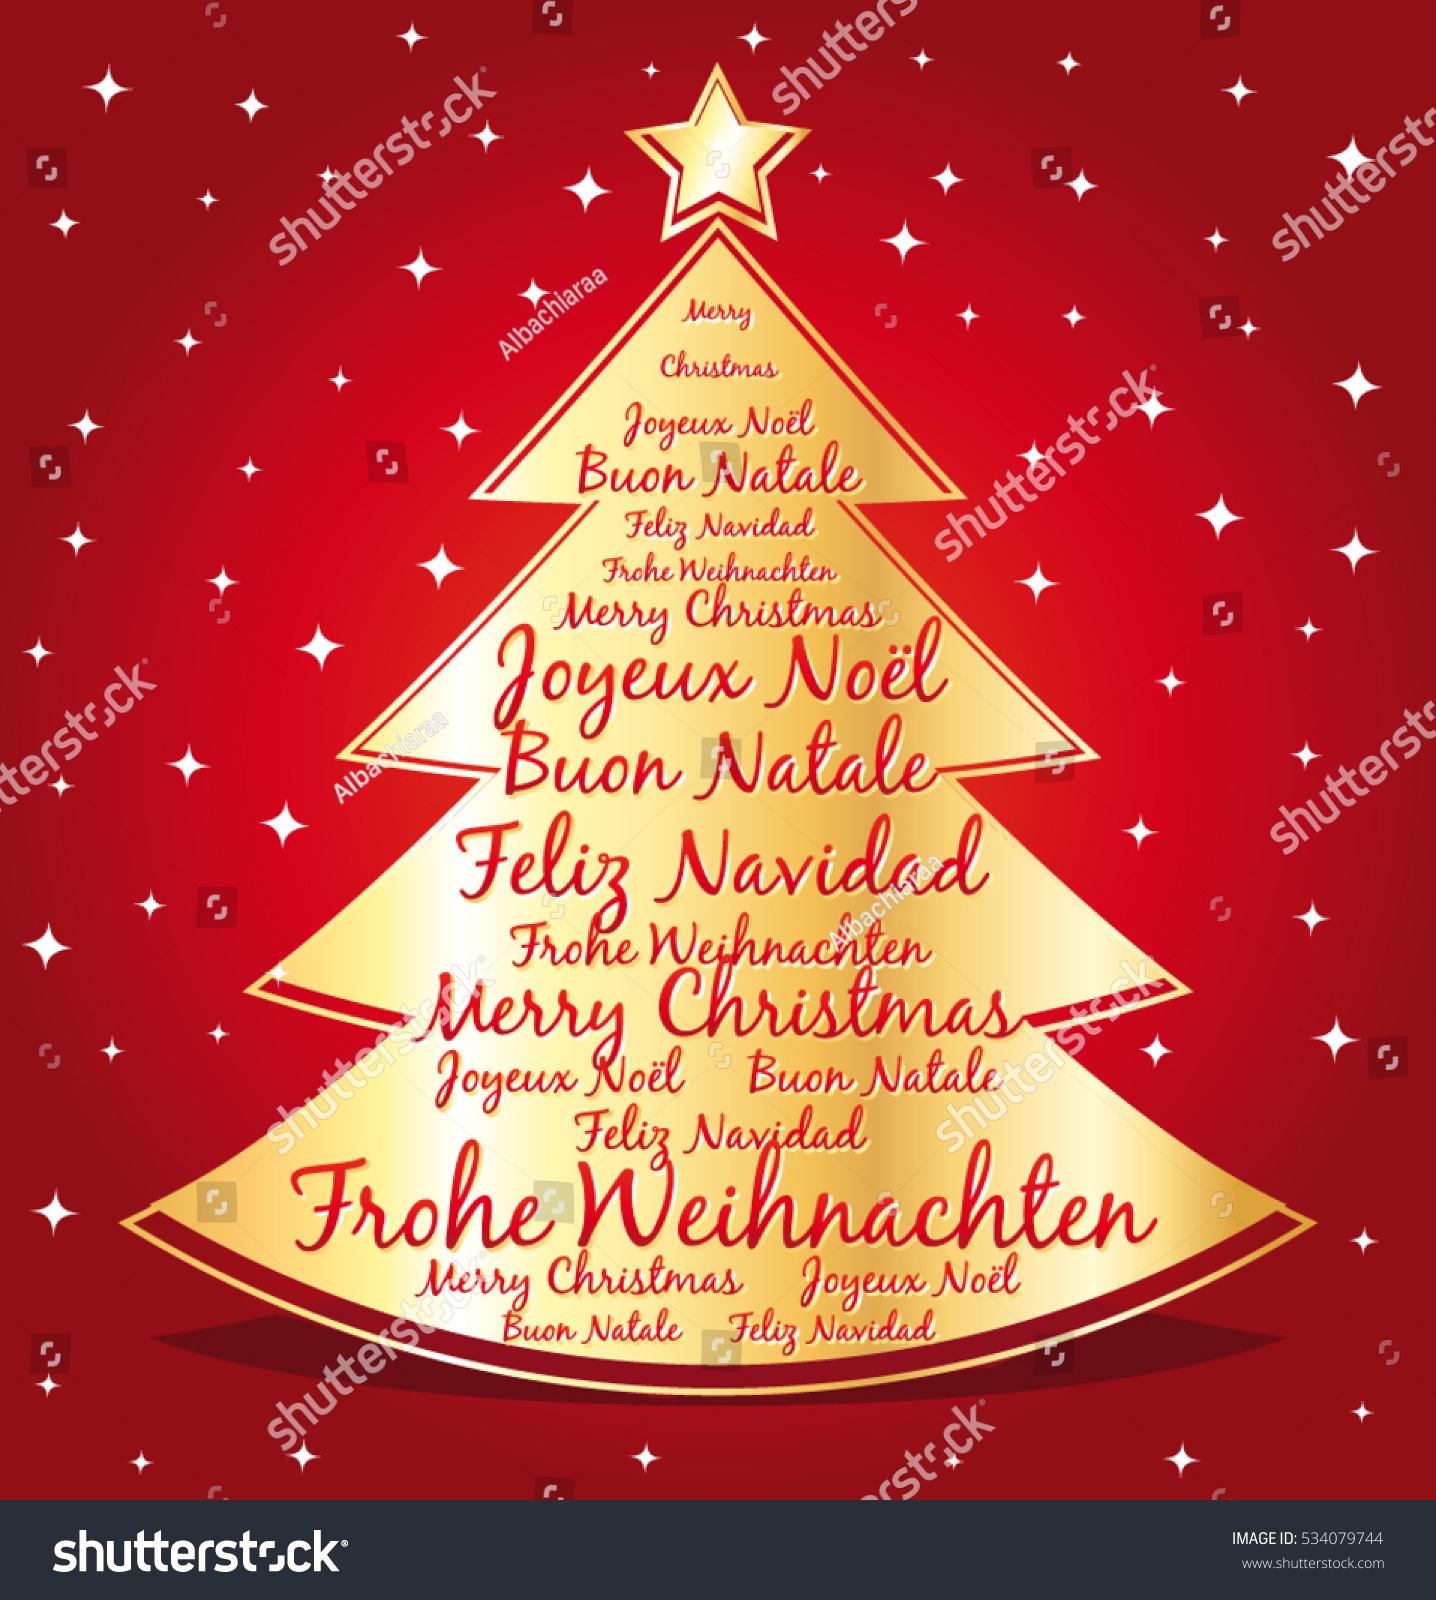 Merry Christmas Greetings Spanish